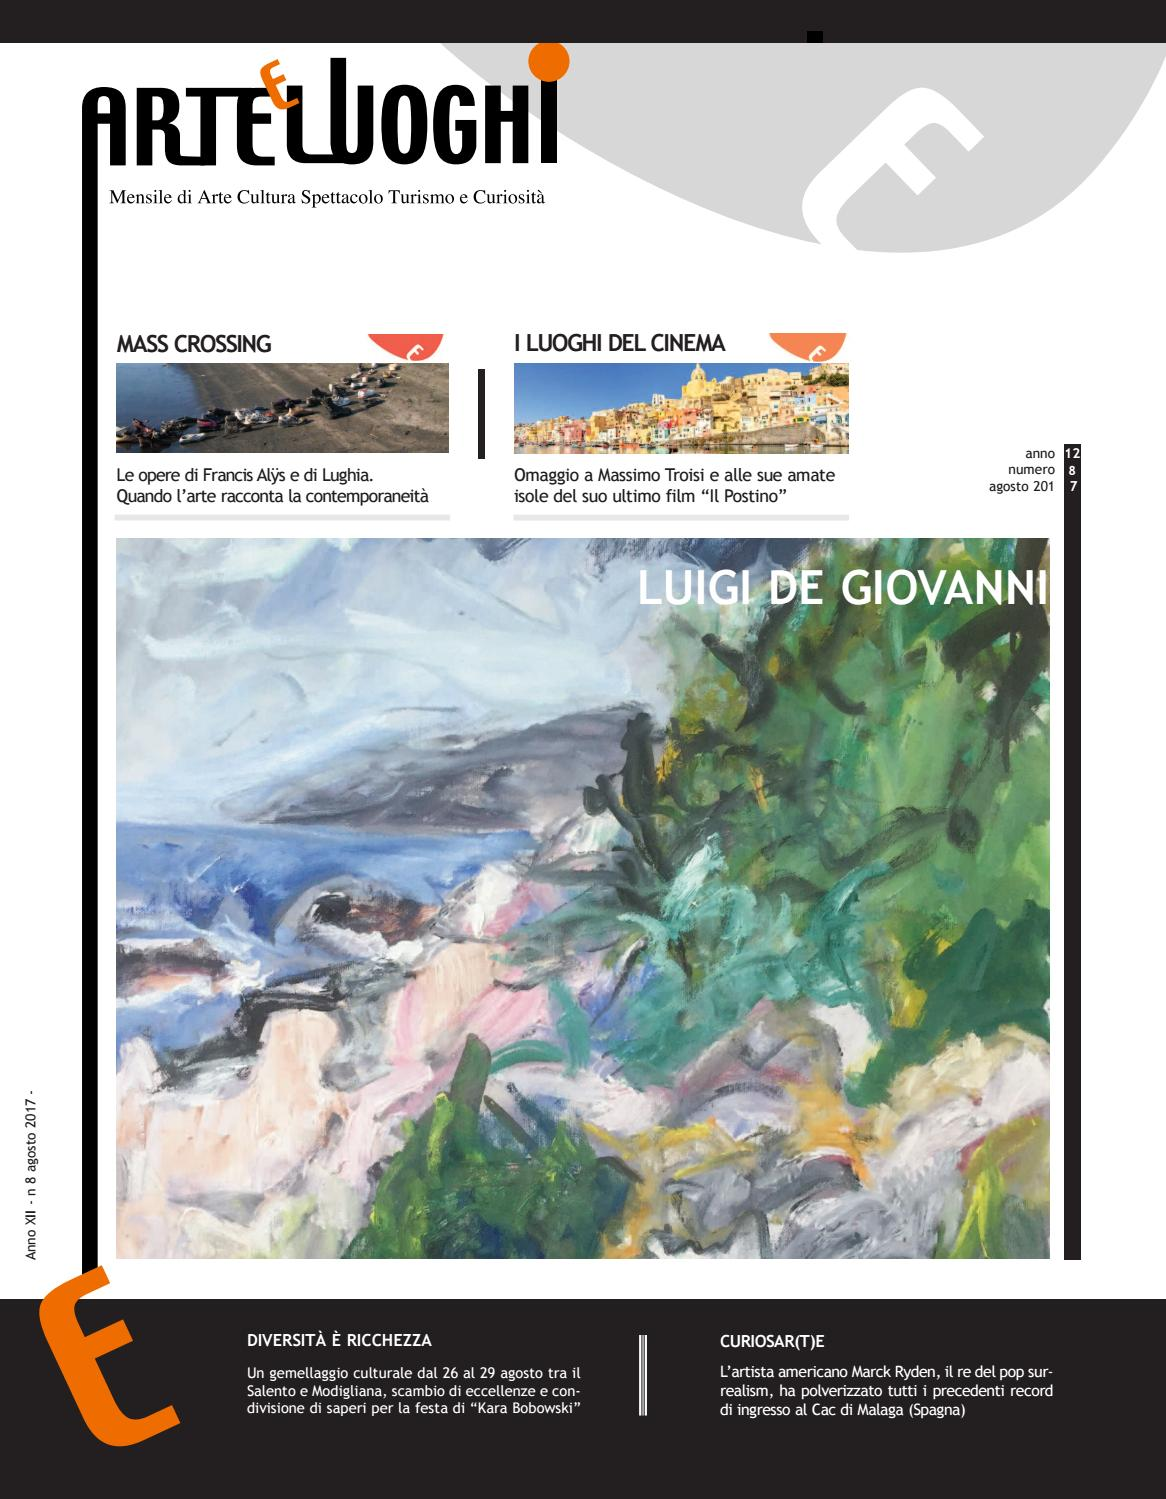 Arte e Luoghi Agosto 2017 by arteeluoghi - issuu 7ff0a13acf38